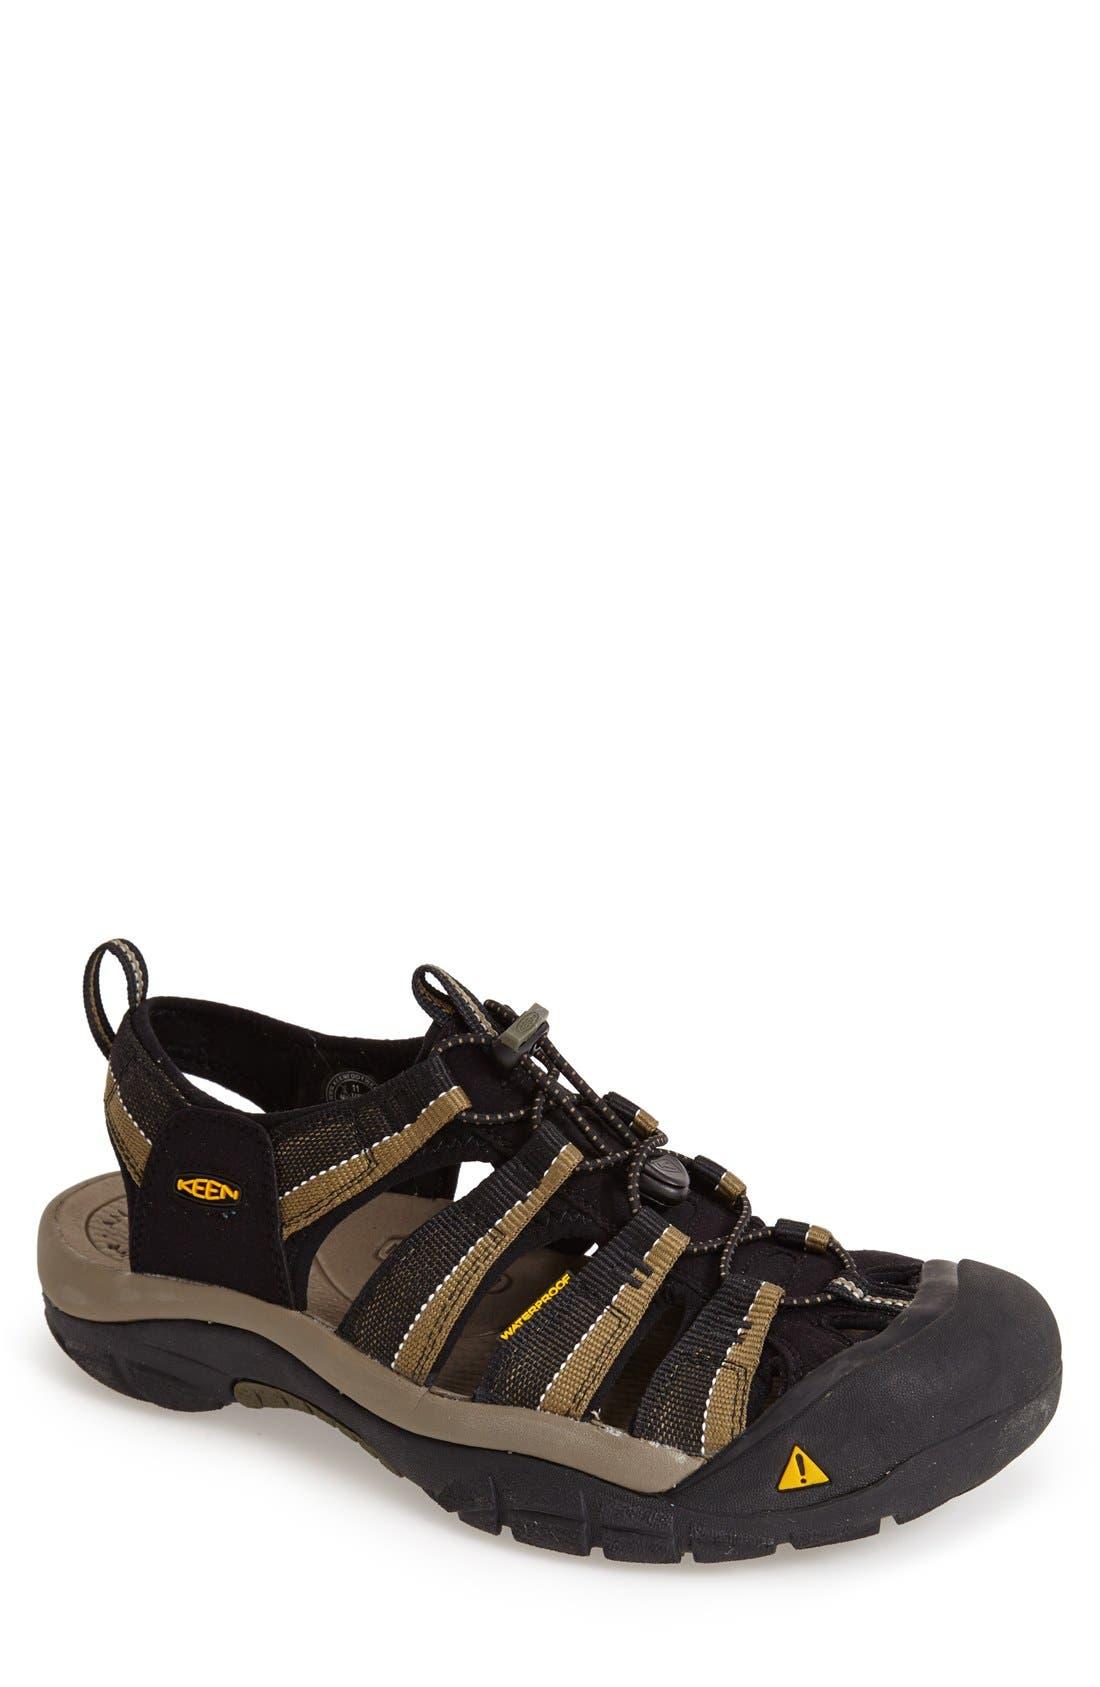 'Newport H2' Sandal,                             Main thumbnail 1, color,                             BLACK/ STONE GREY